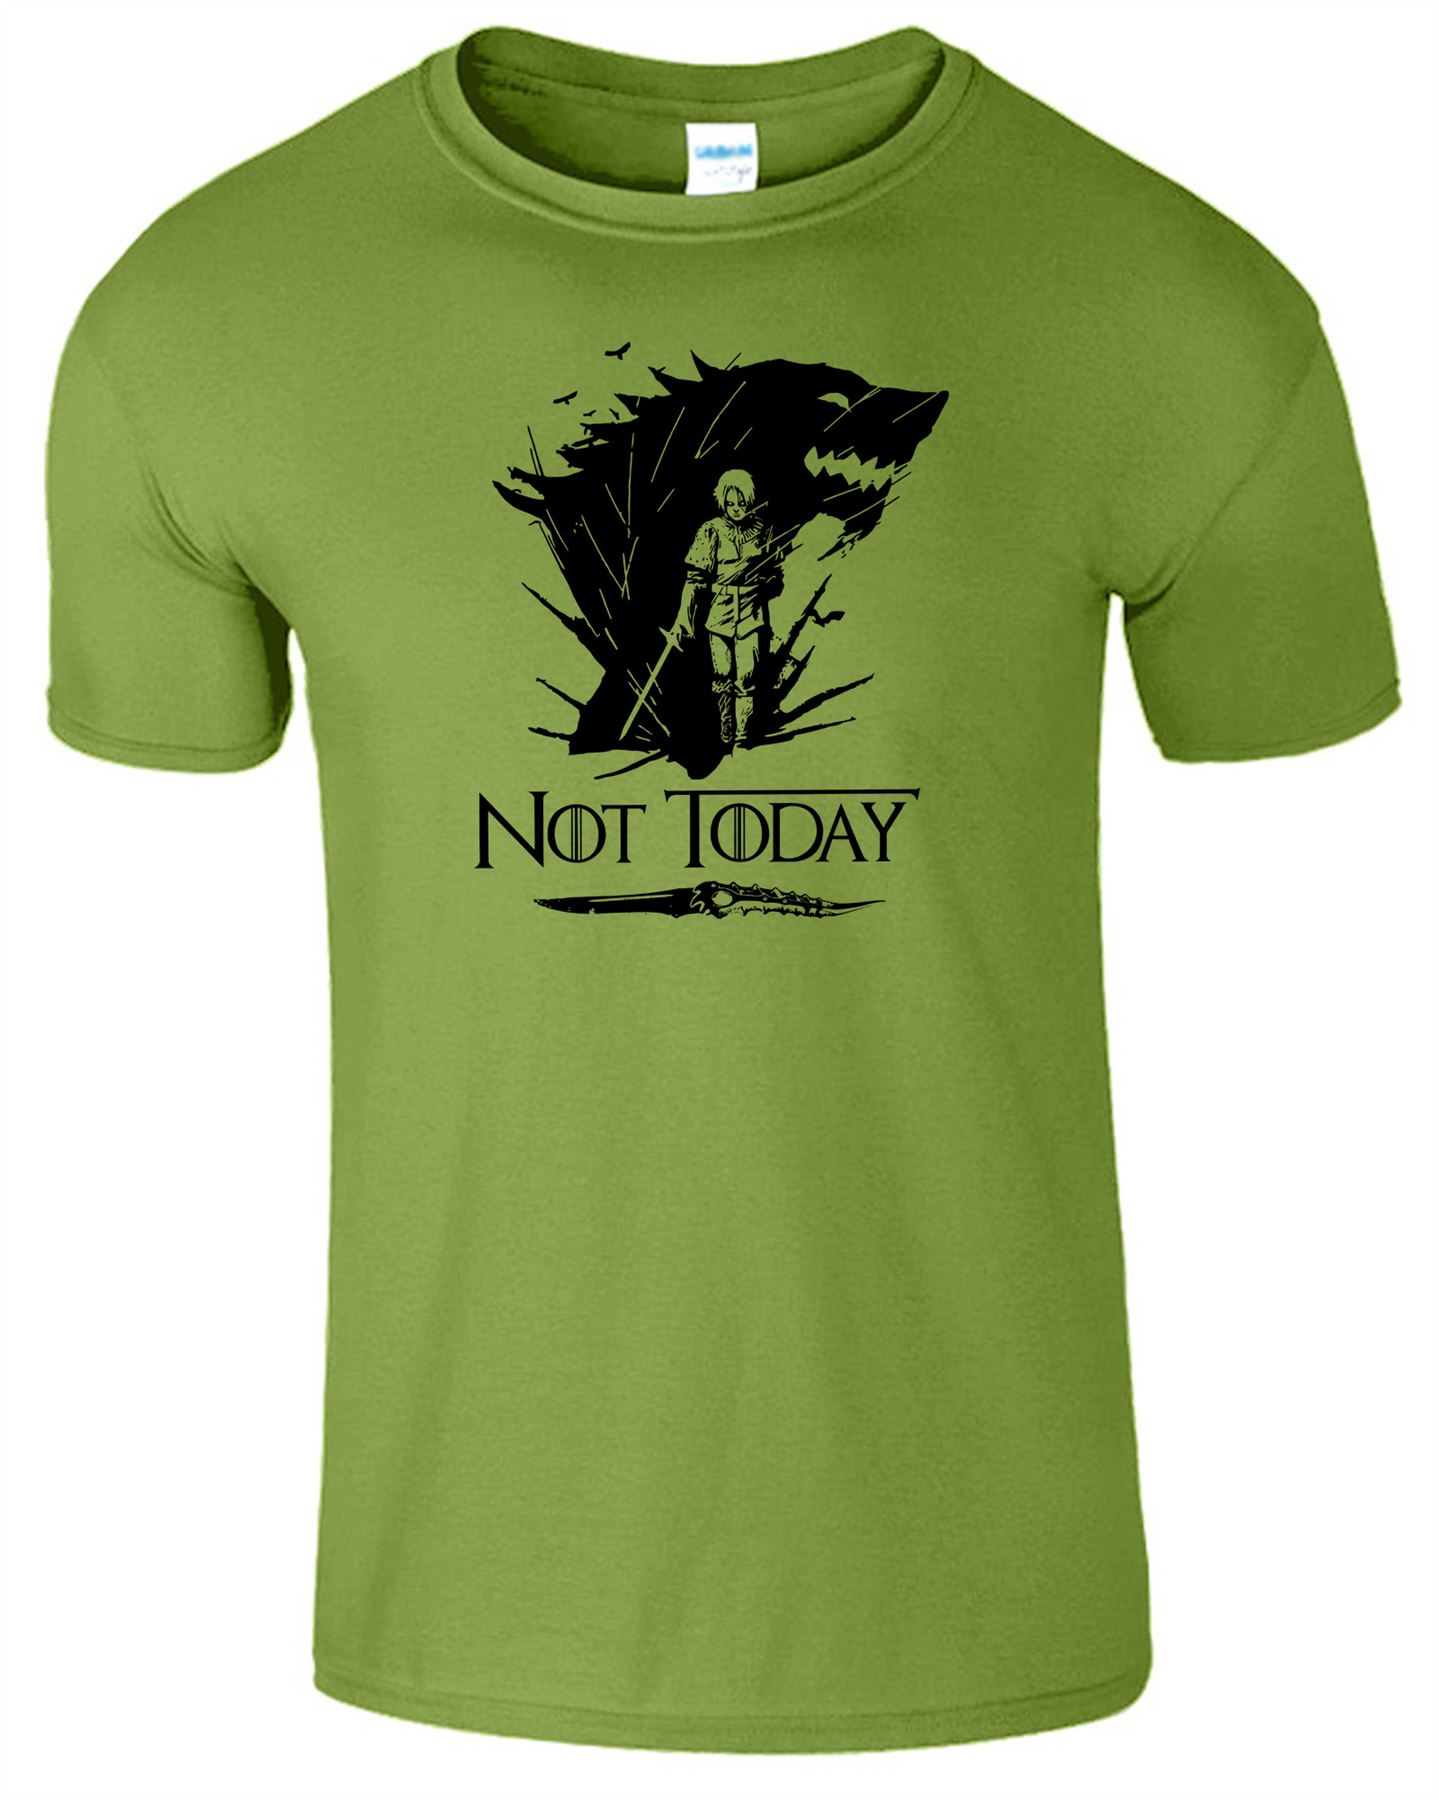 Arya-Stark-Not-Today-T-Shirt-Mens-Game-Season-Womens-Shirt-Adults-Unisex-Fit Indexbild 25